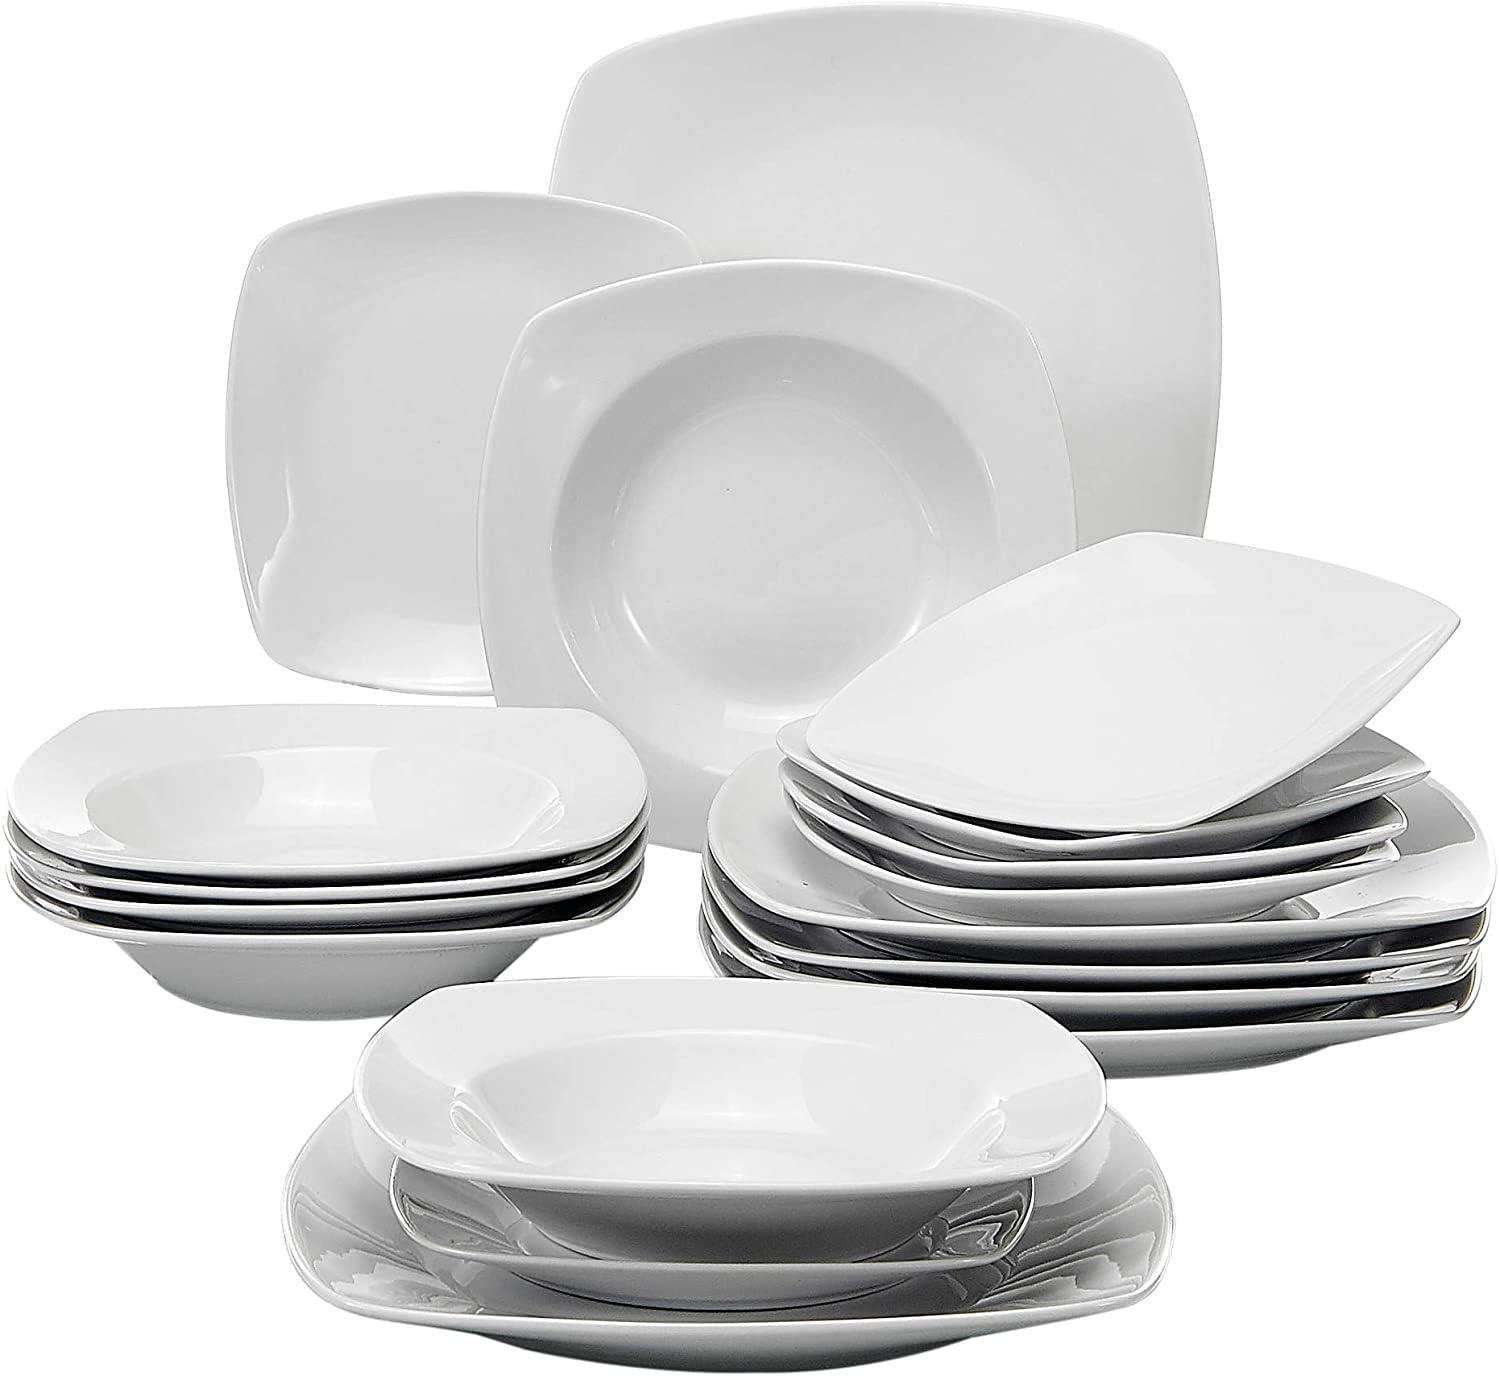 Malacasa ELVIRA 18pcs Porcelain Ceramic Coffee Tea Cups Saucers Dessert Plates